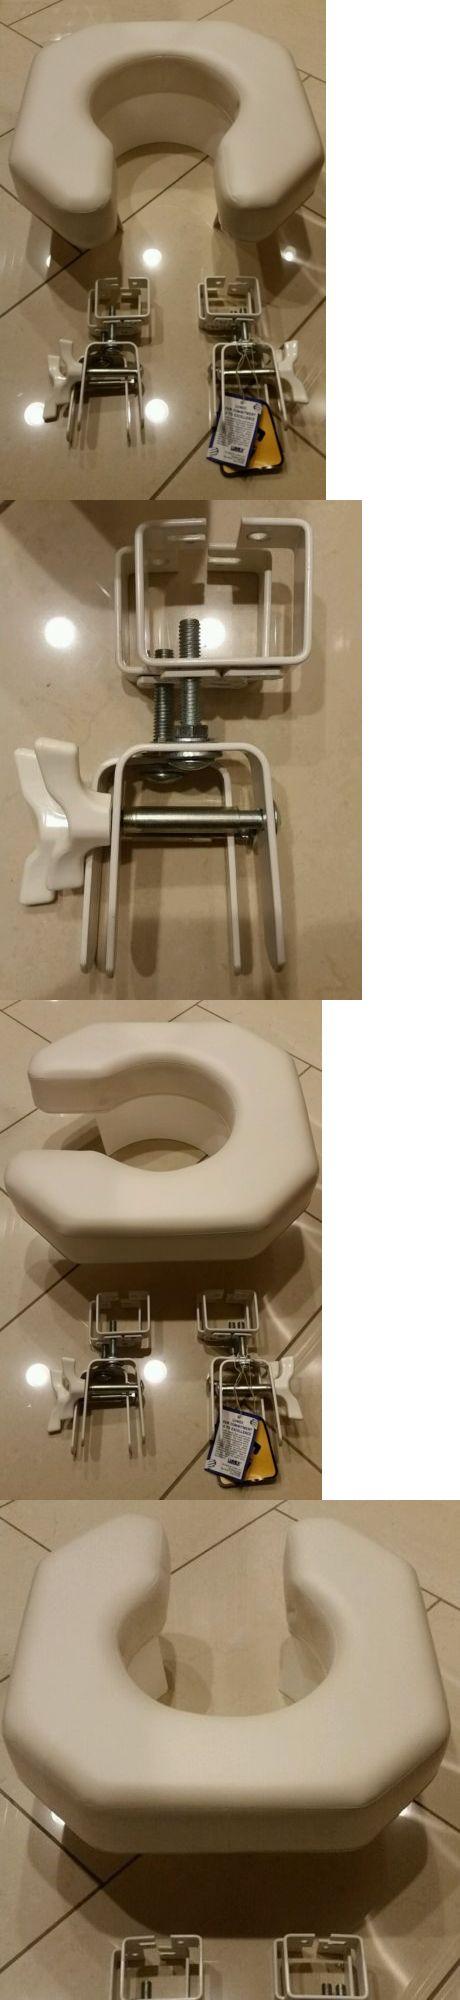 1000 Ideas About Toilet Seats On Pinterest Soft Close